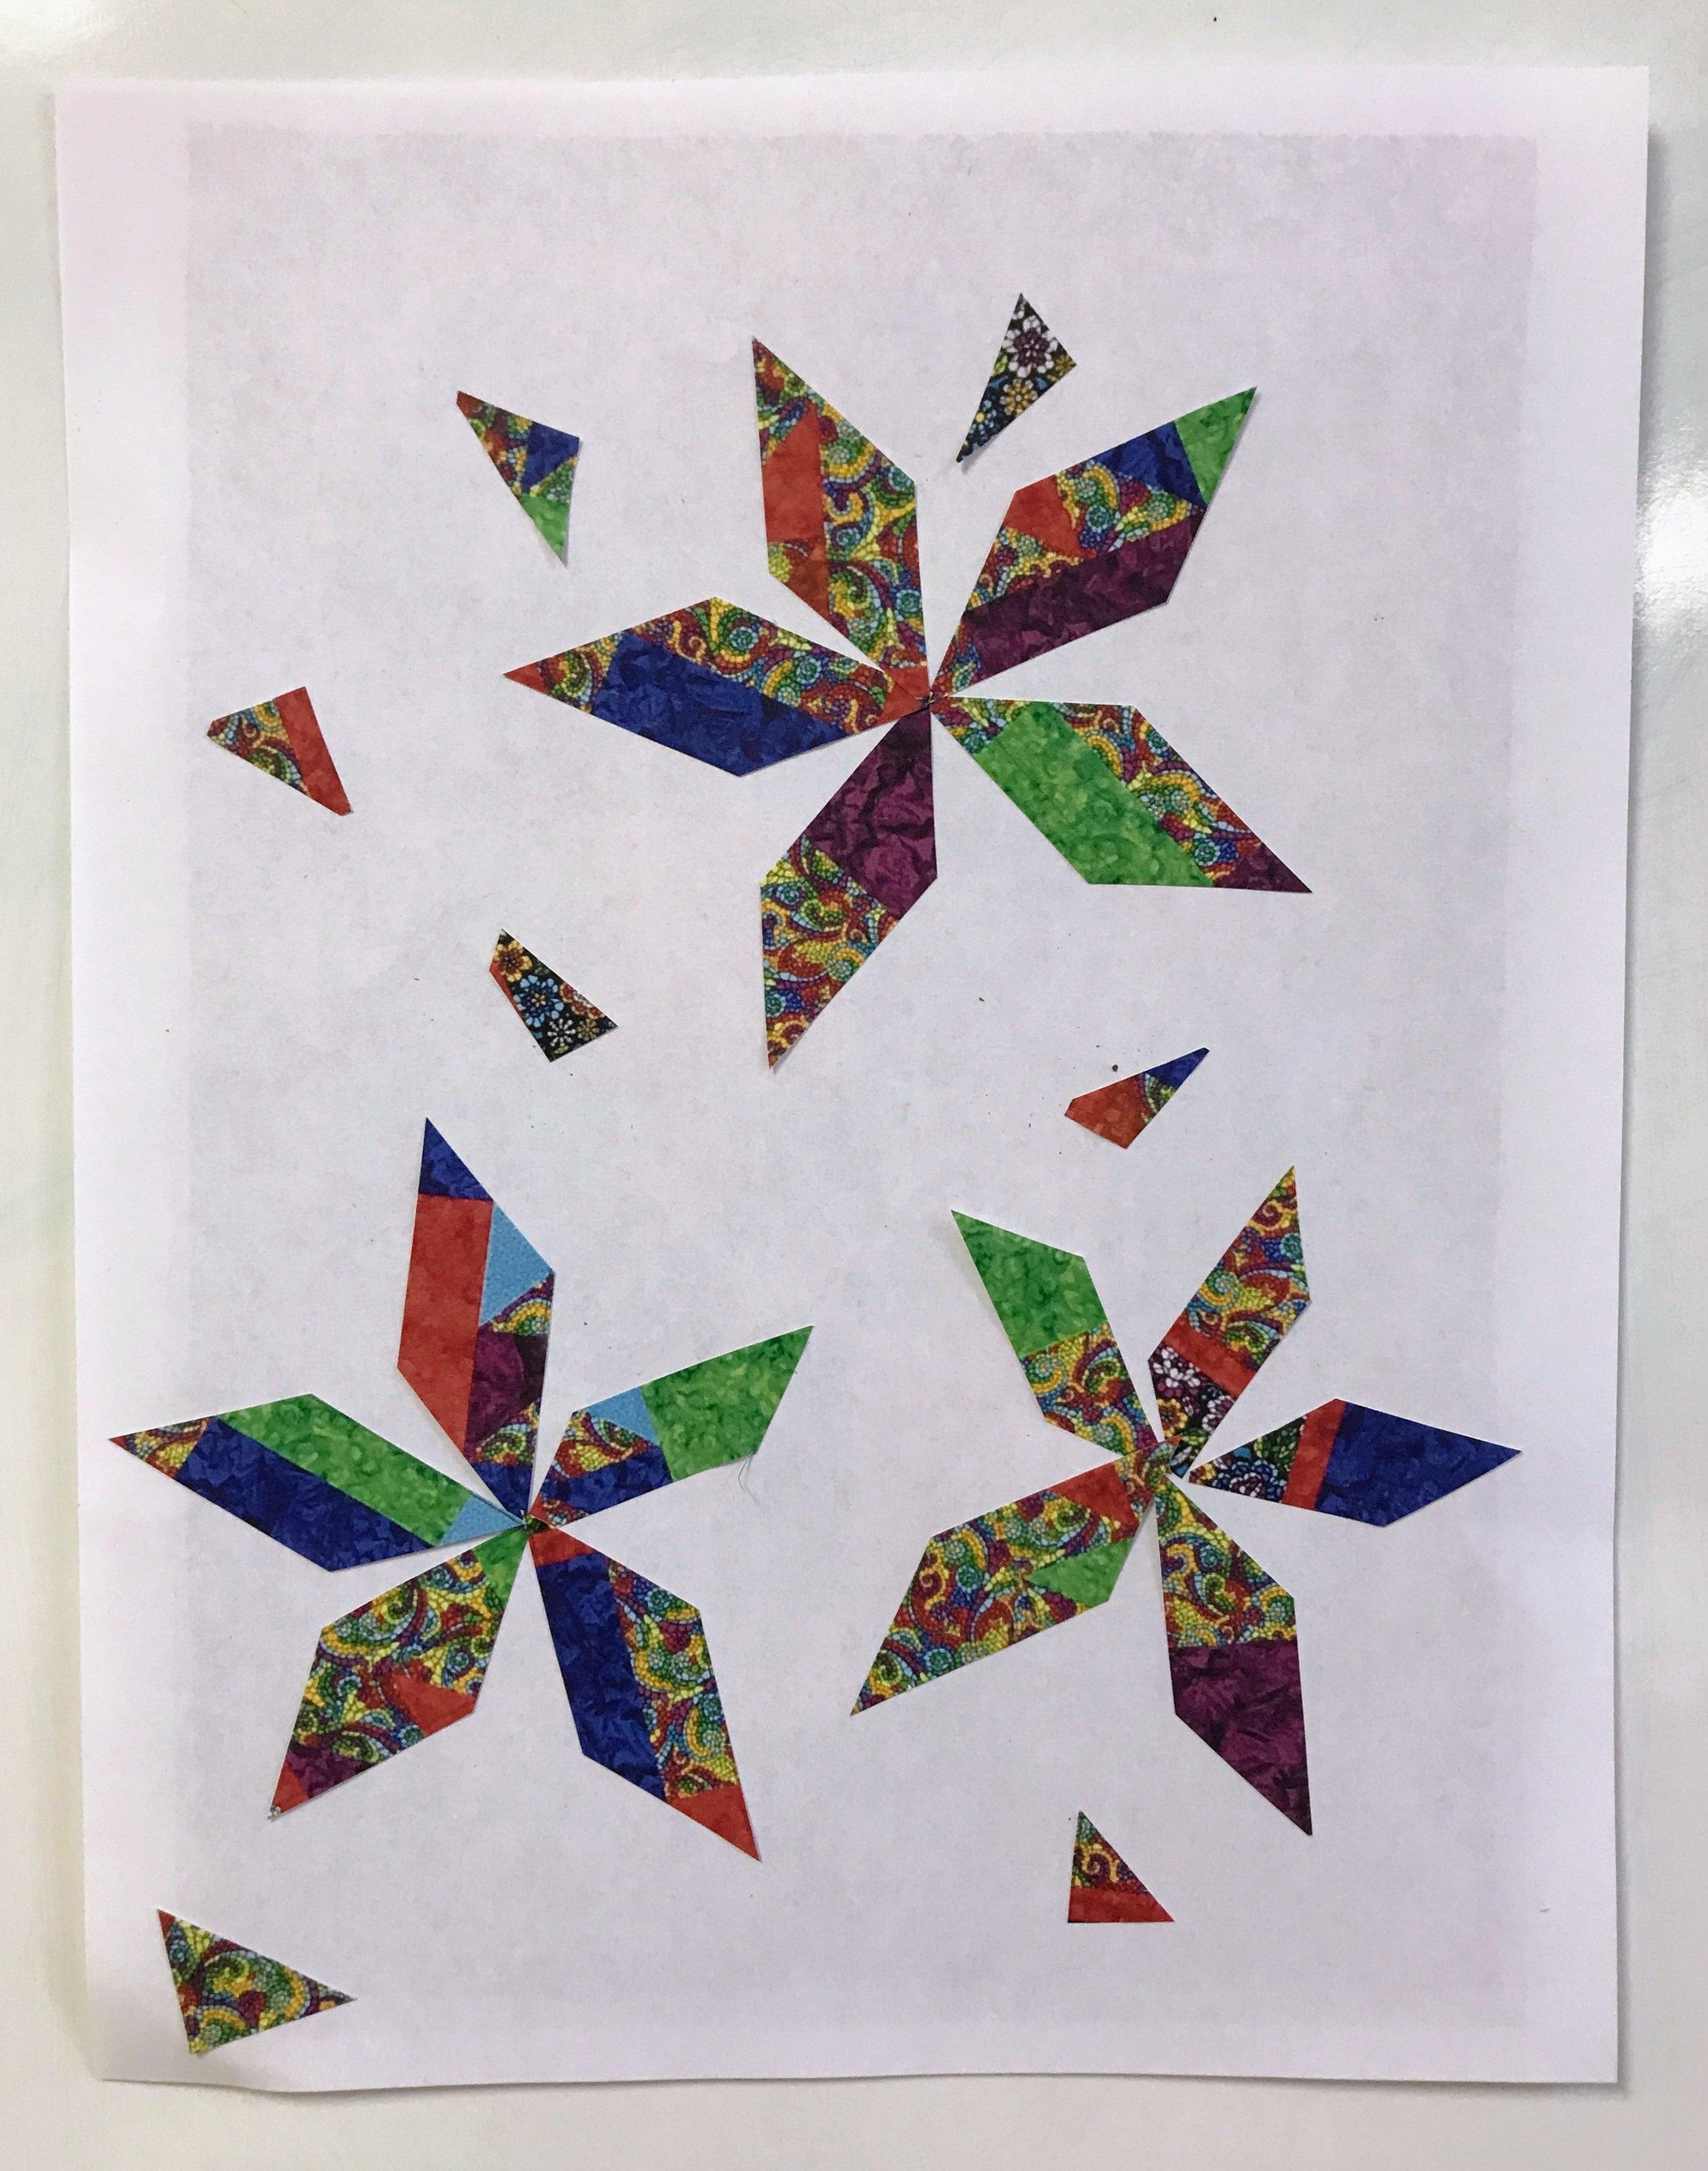 Design by Mary Keasler